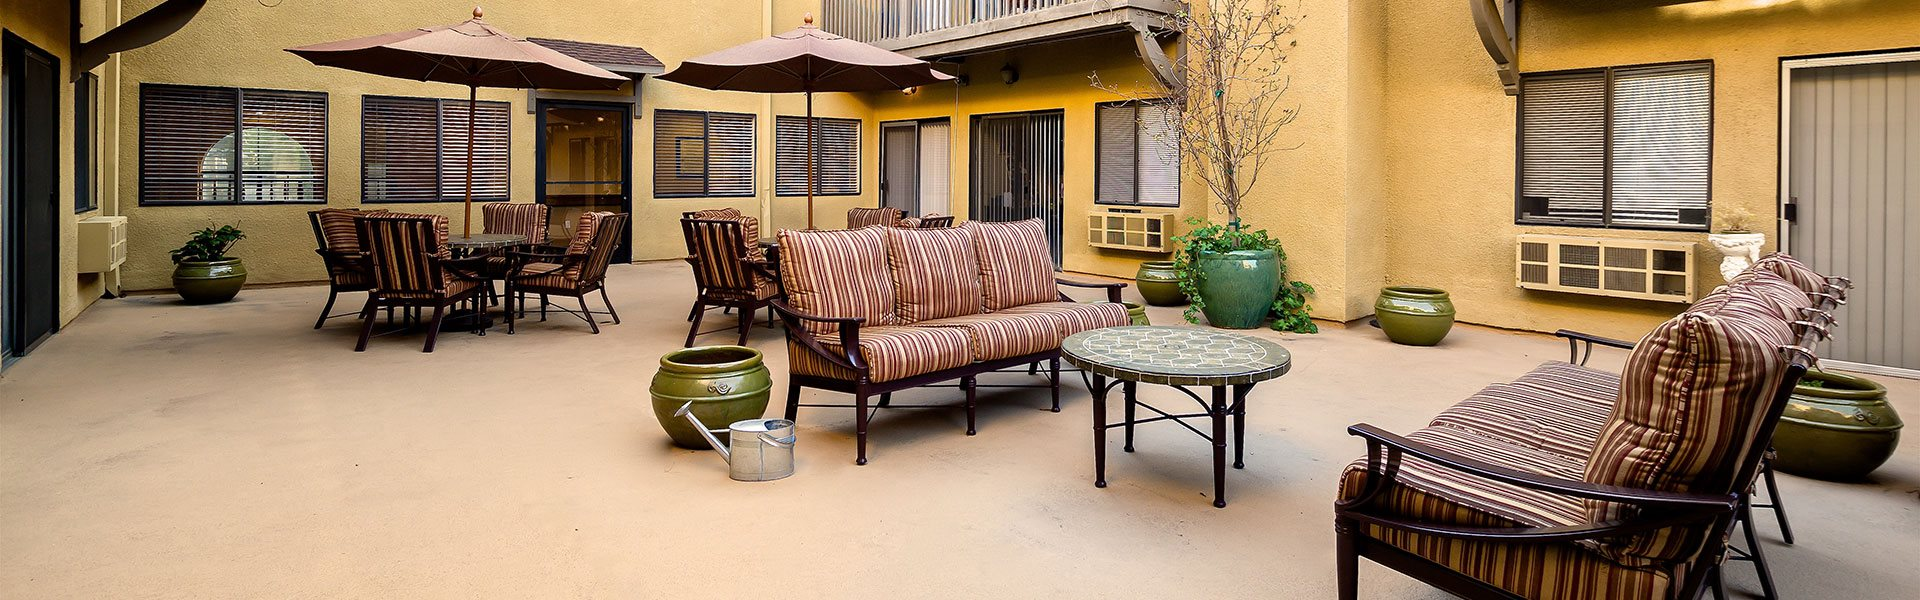 Sun Porch Courtyard at Pacifica Senior Living Santa Clarita, Newhall, California